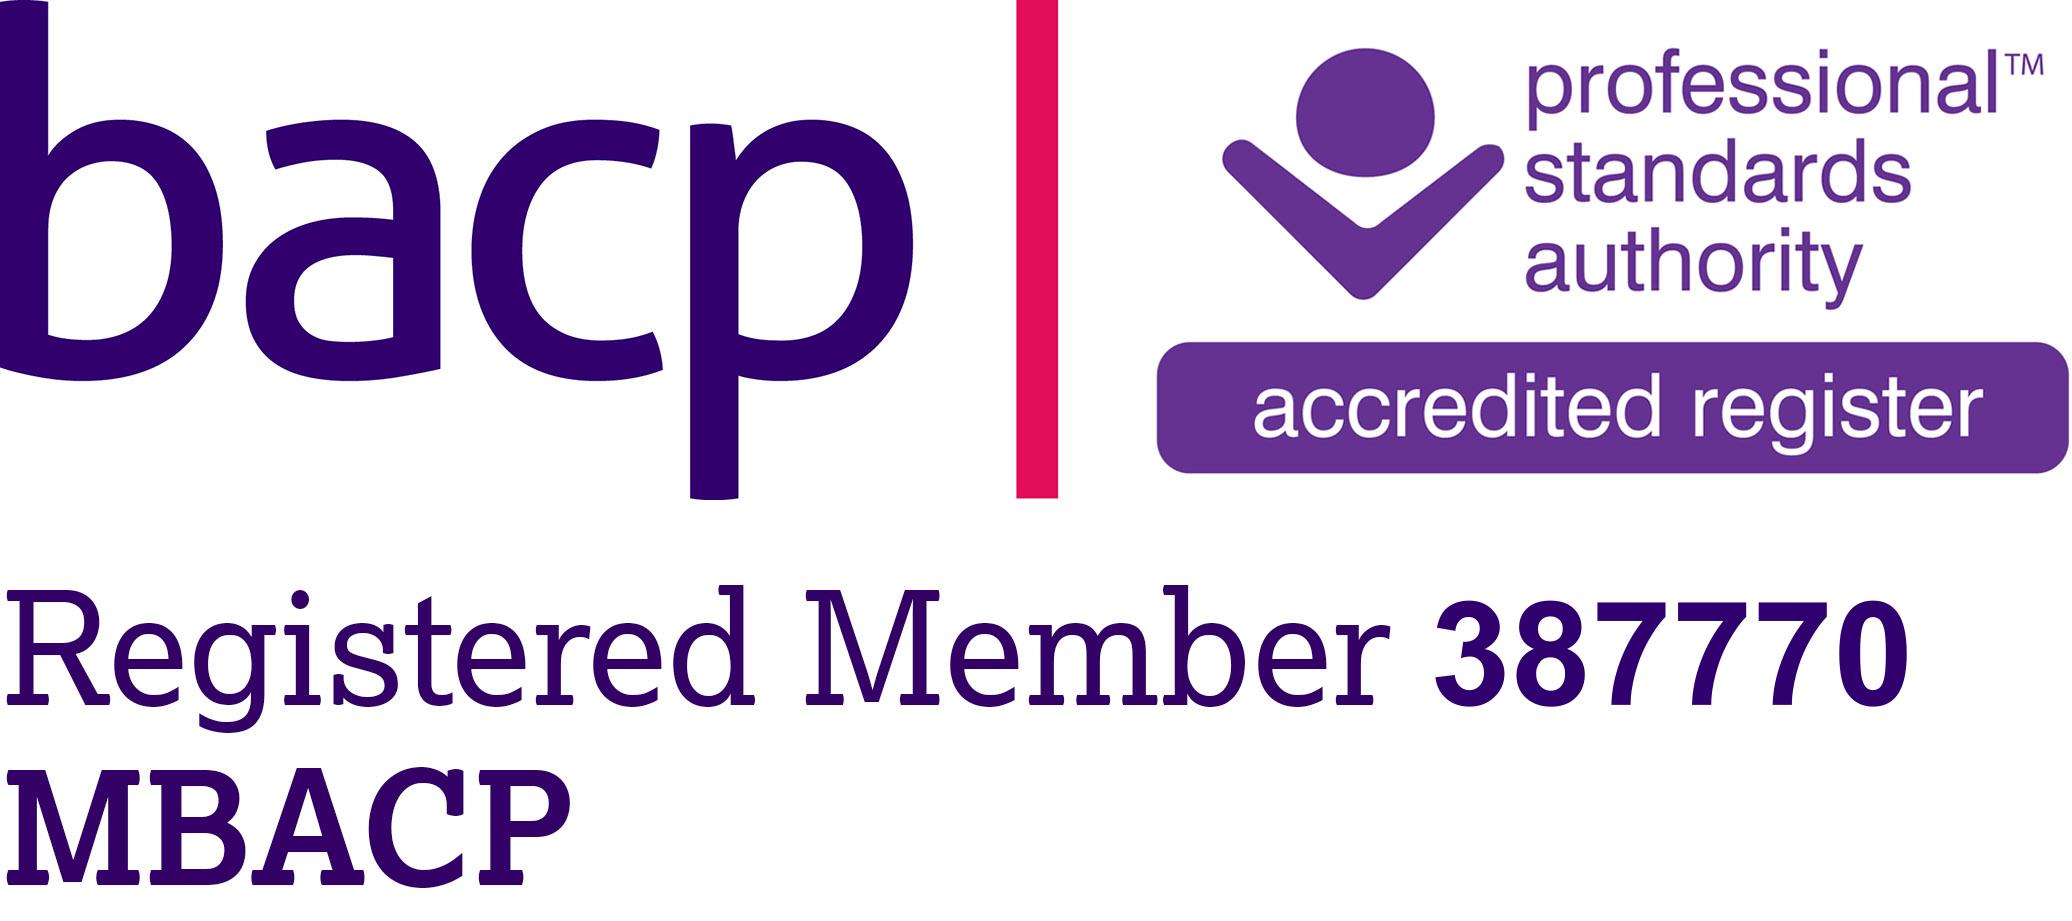 MBACP Accreditation Logo